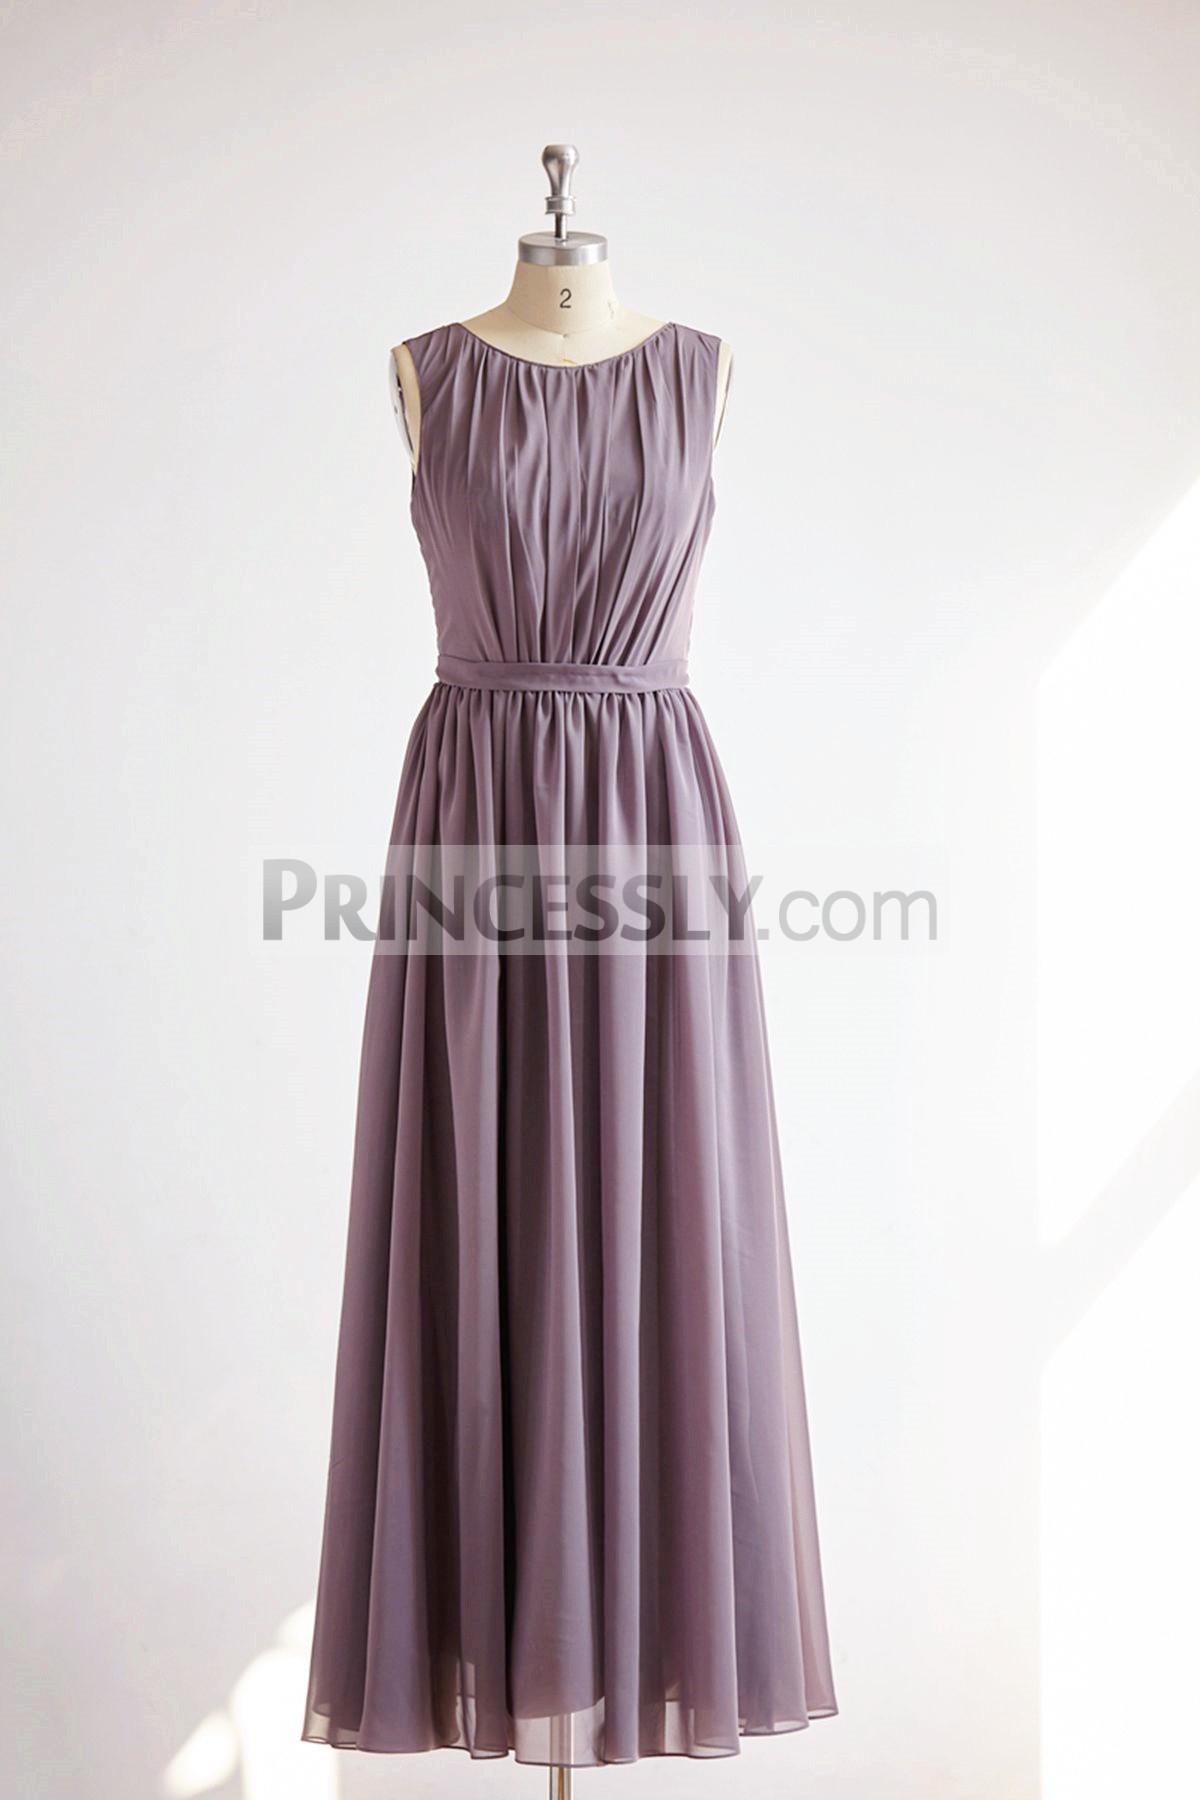 Princessly.com-K1000327-V Back Gray Chiffon Long Wedding Bridesmaid Dress-31